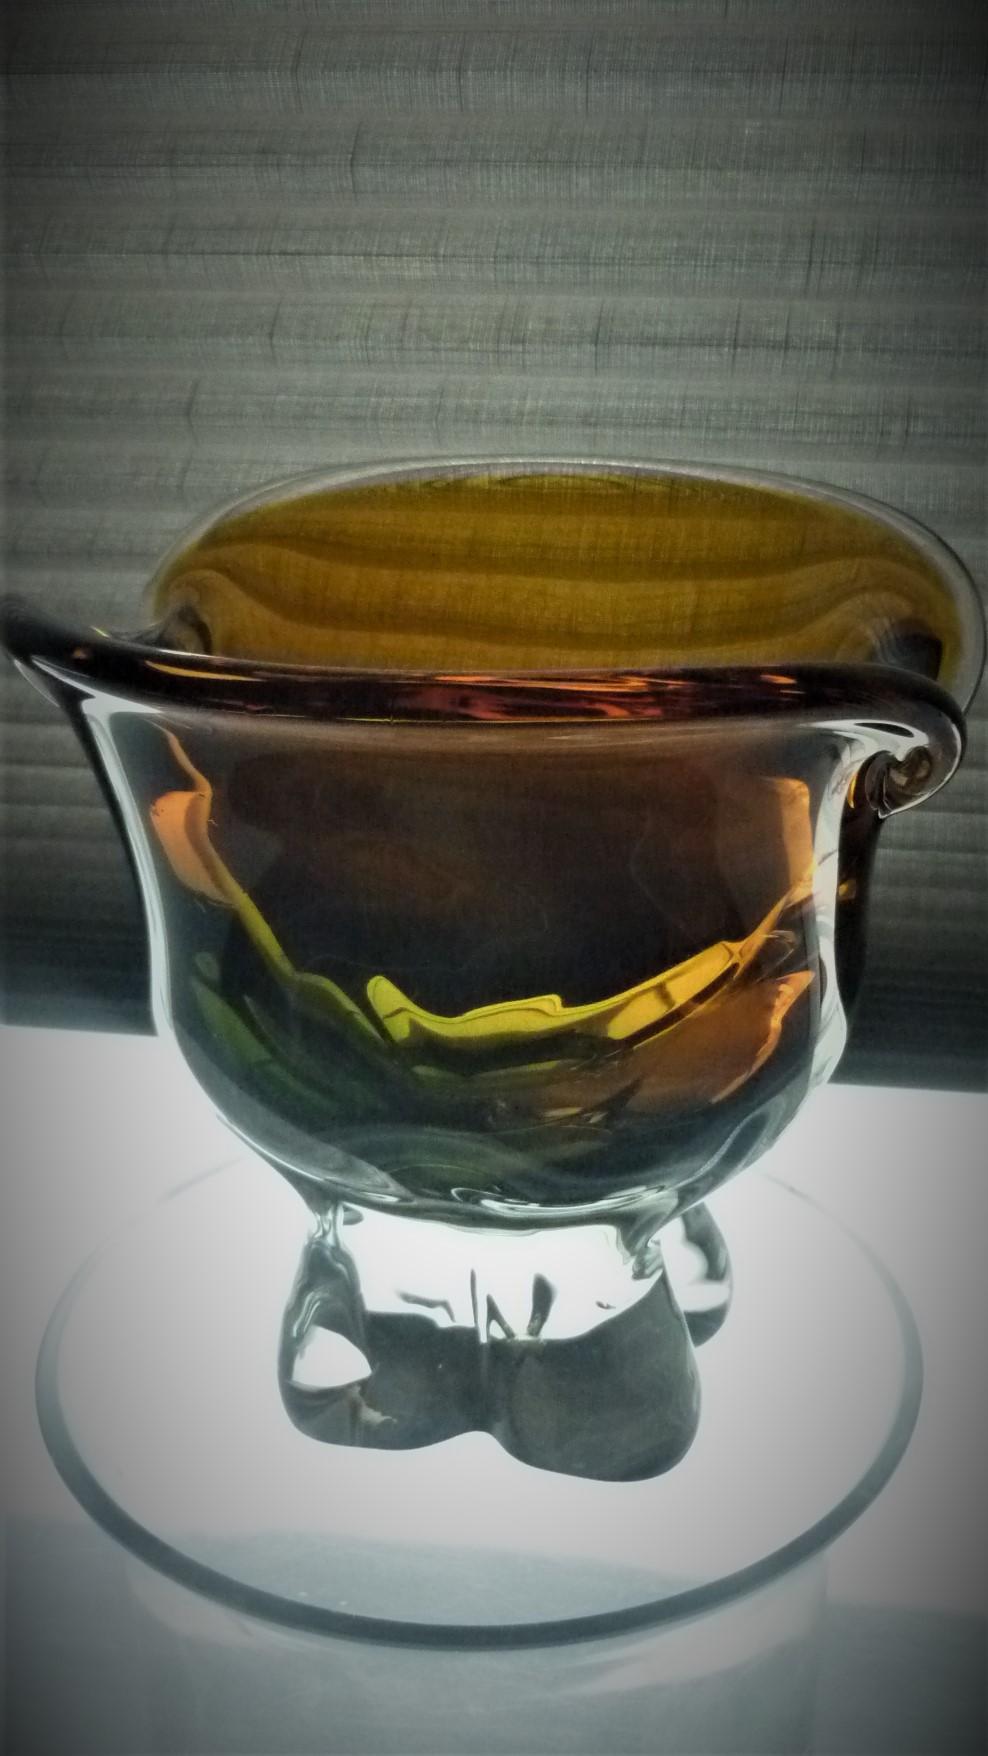 1960s vintage Czech green and amber glass vase by maker Chribska and probably designed by Josef Hospodka.